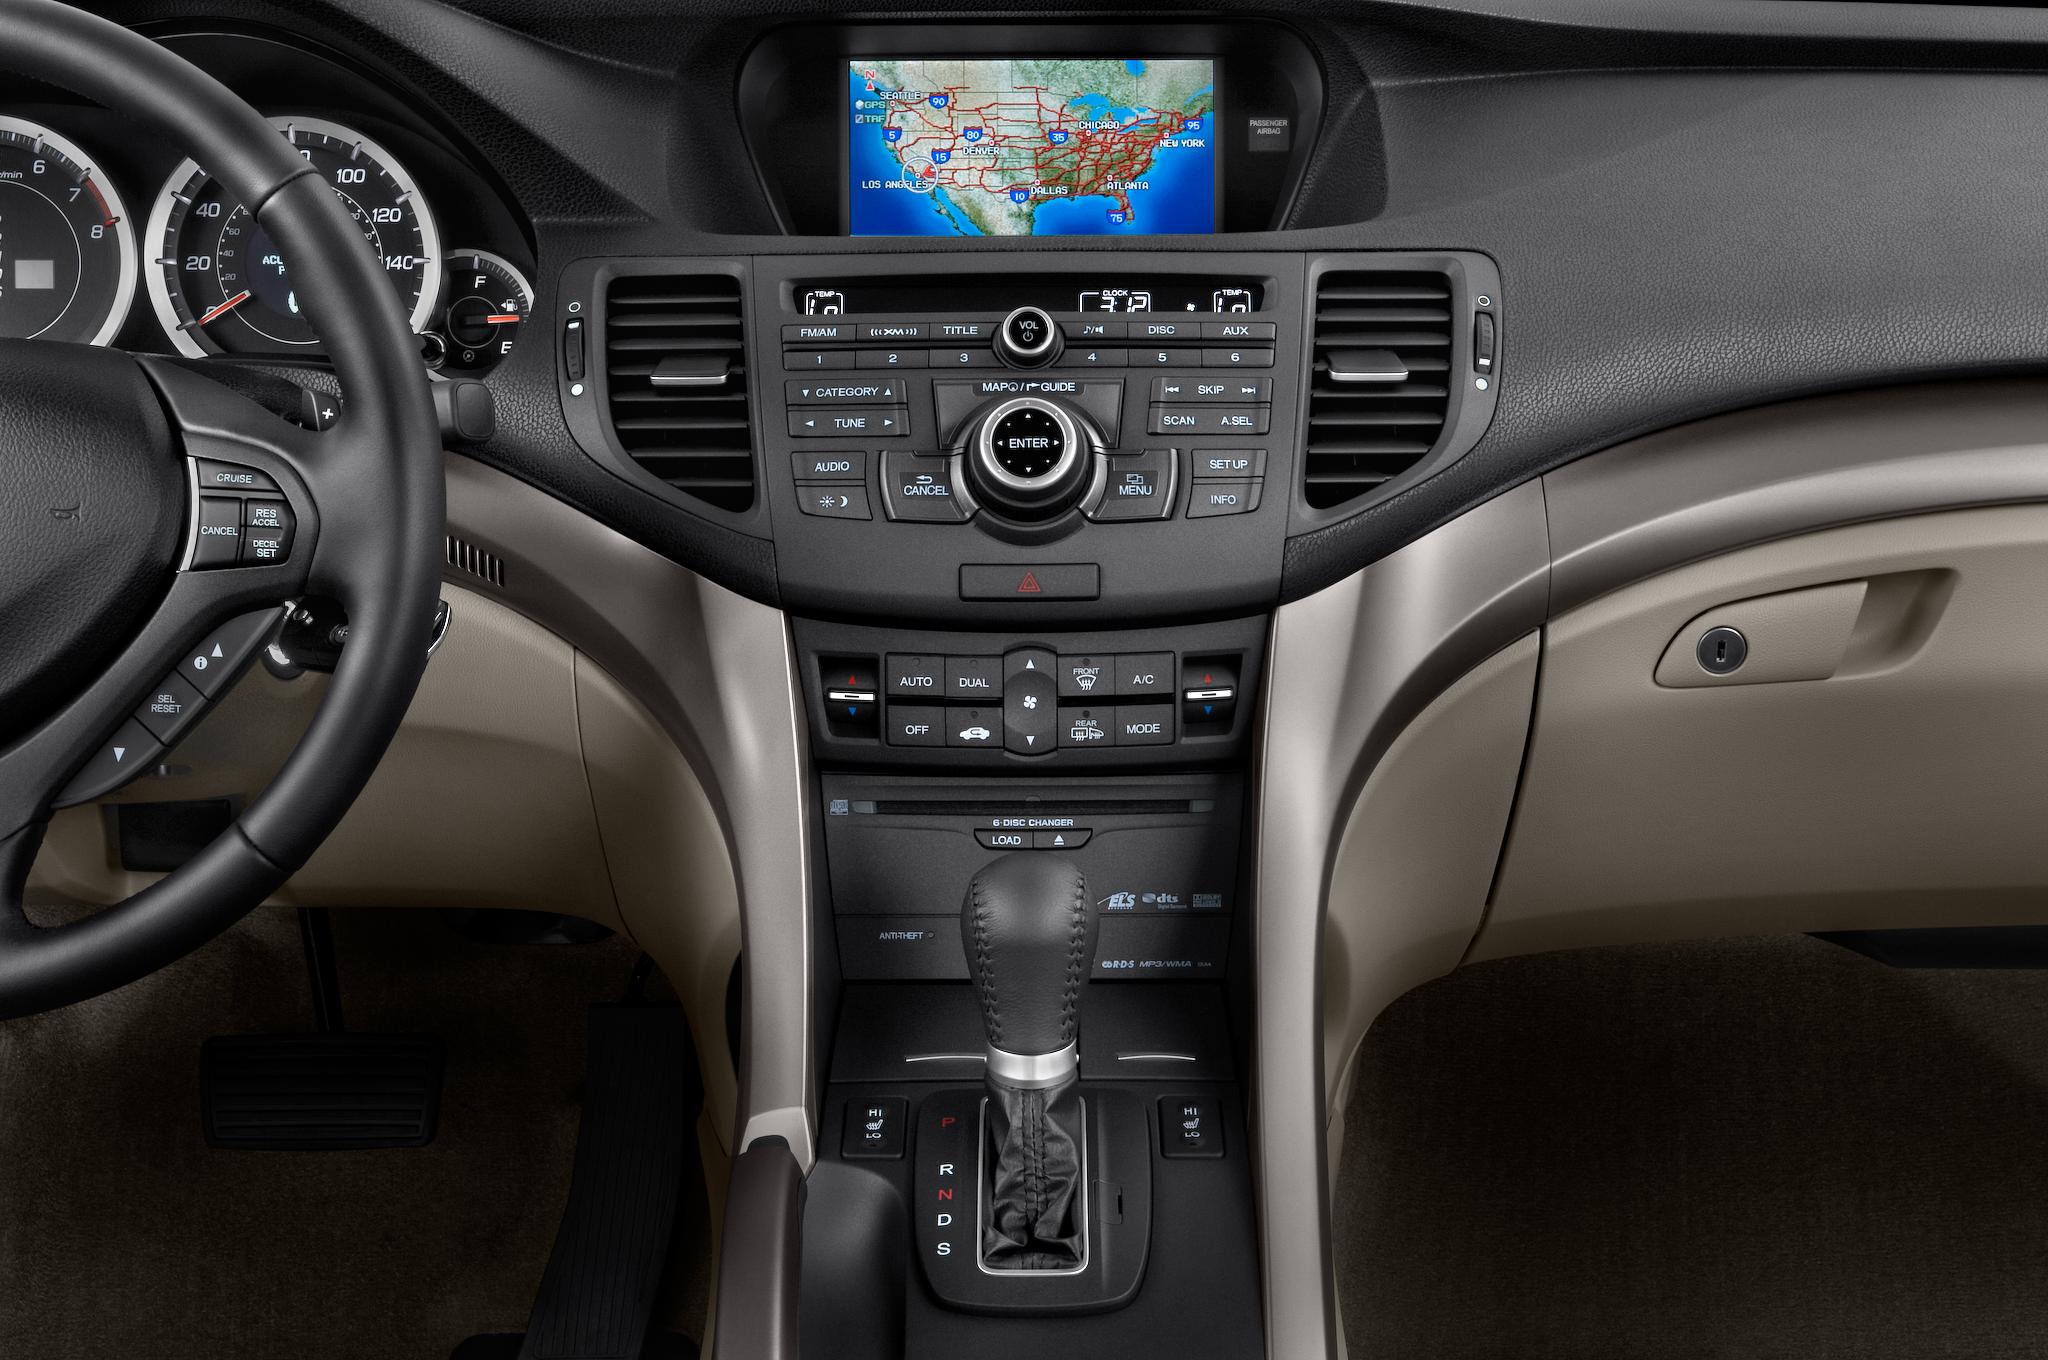 Acura Tsx Manual Transmission Data Wiring Diagrams - Acura tsx manual transmission